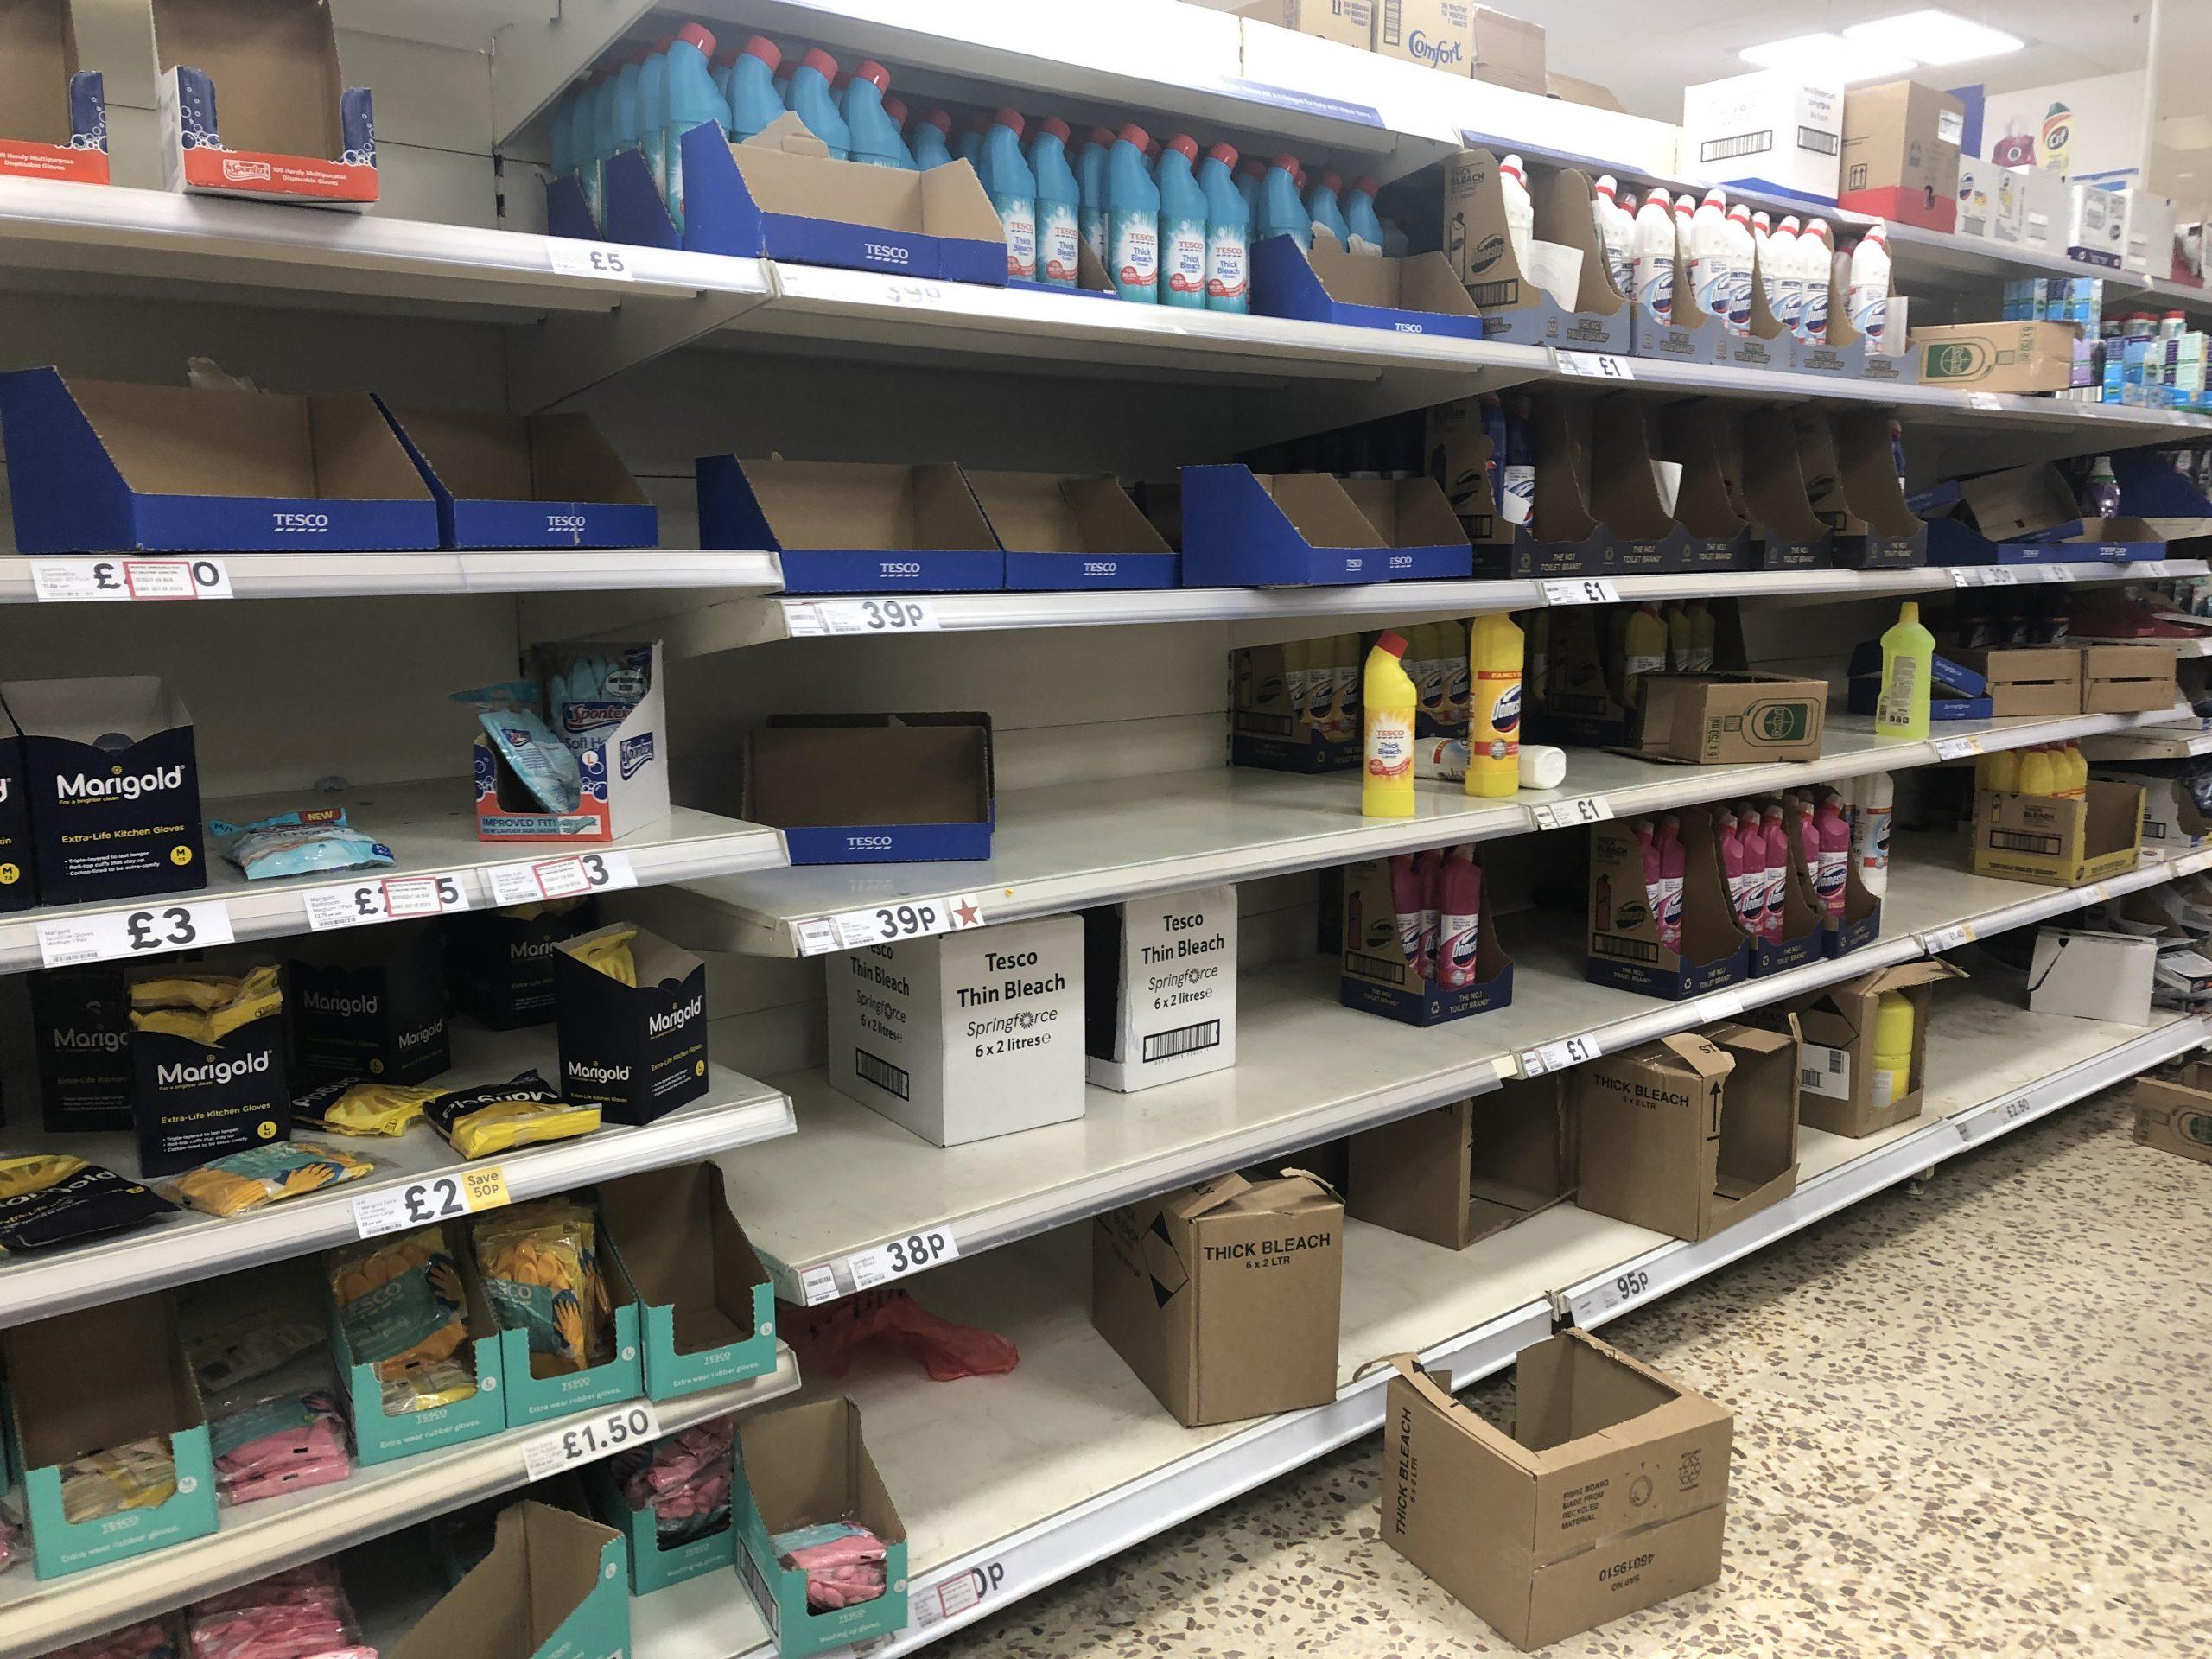 Shelves at a Tesco shop during the coronavirus pandemic